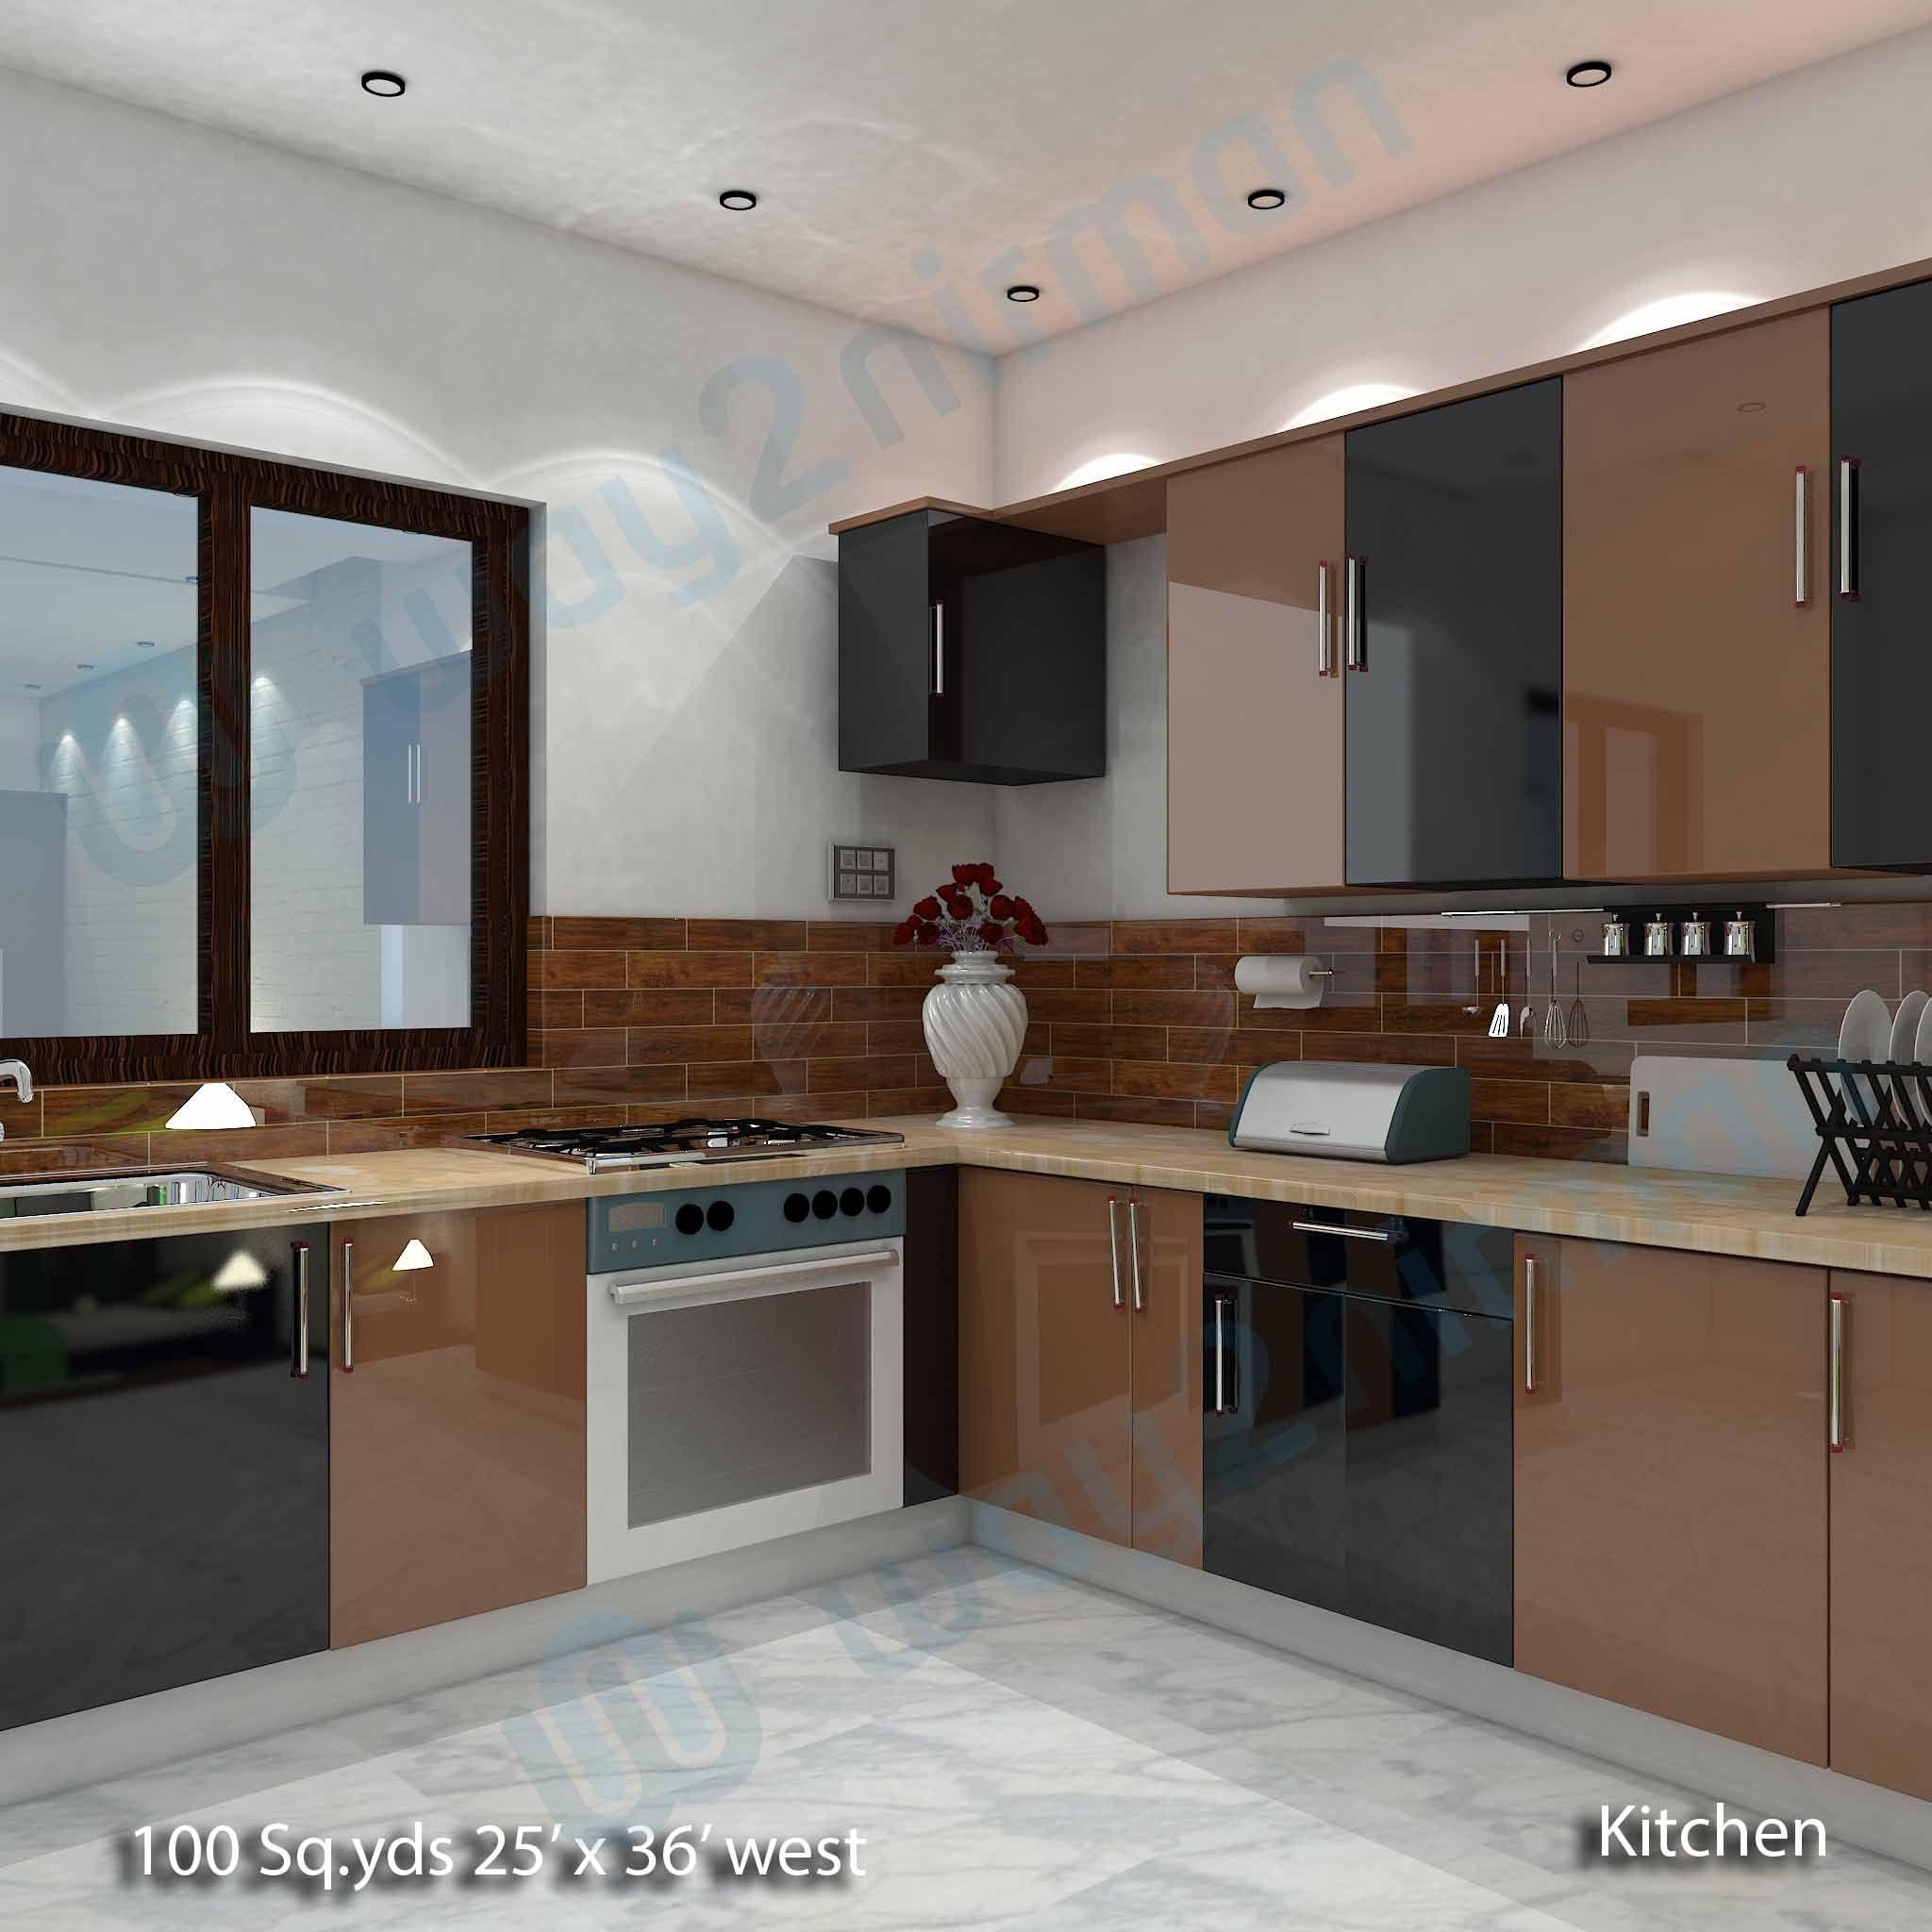 Interior Design Of Small Kitchen Room Kitchen Room Interior Design Interior Design Kitchen Minimalist Kitchen Design